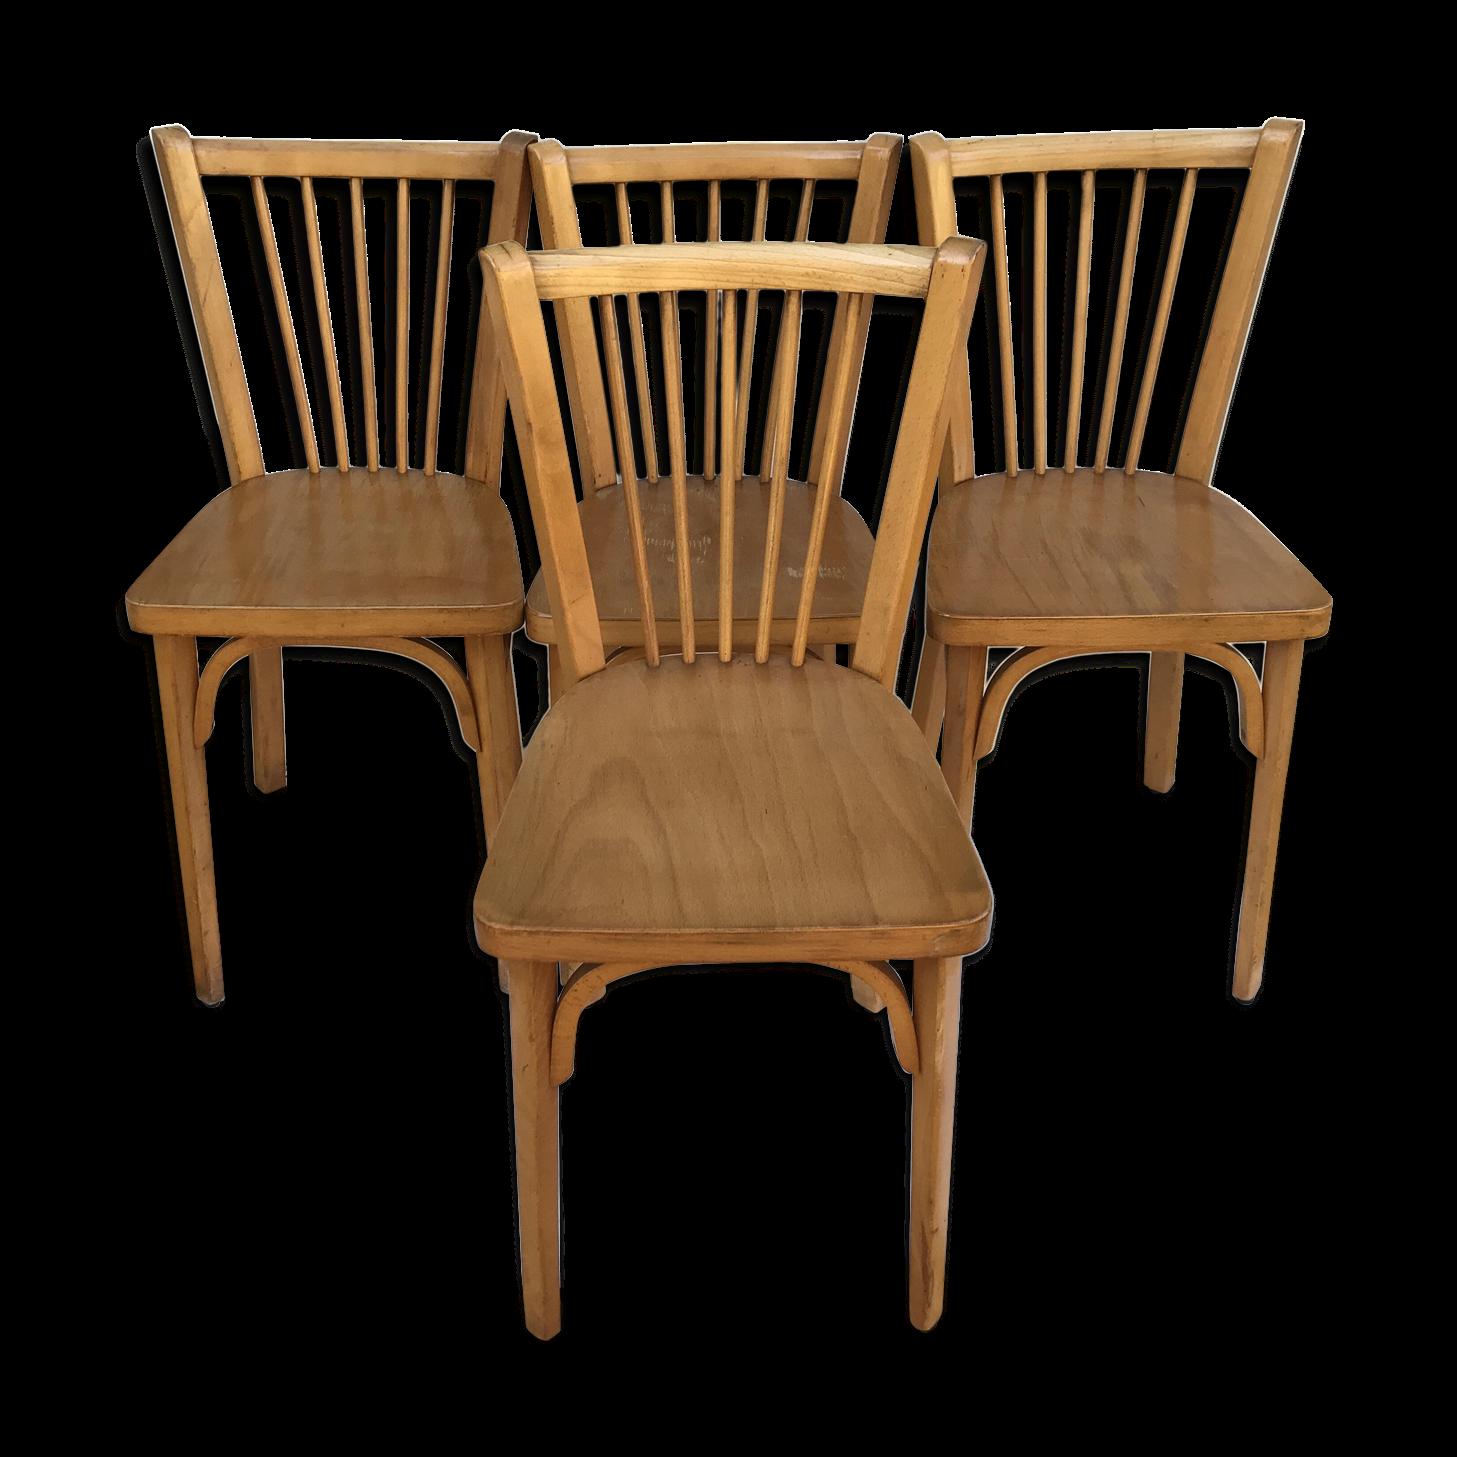 chaise baumann prix 161 chaise id es. Black Bedroom Furniture Sets. Home Design Ideas